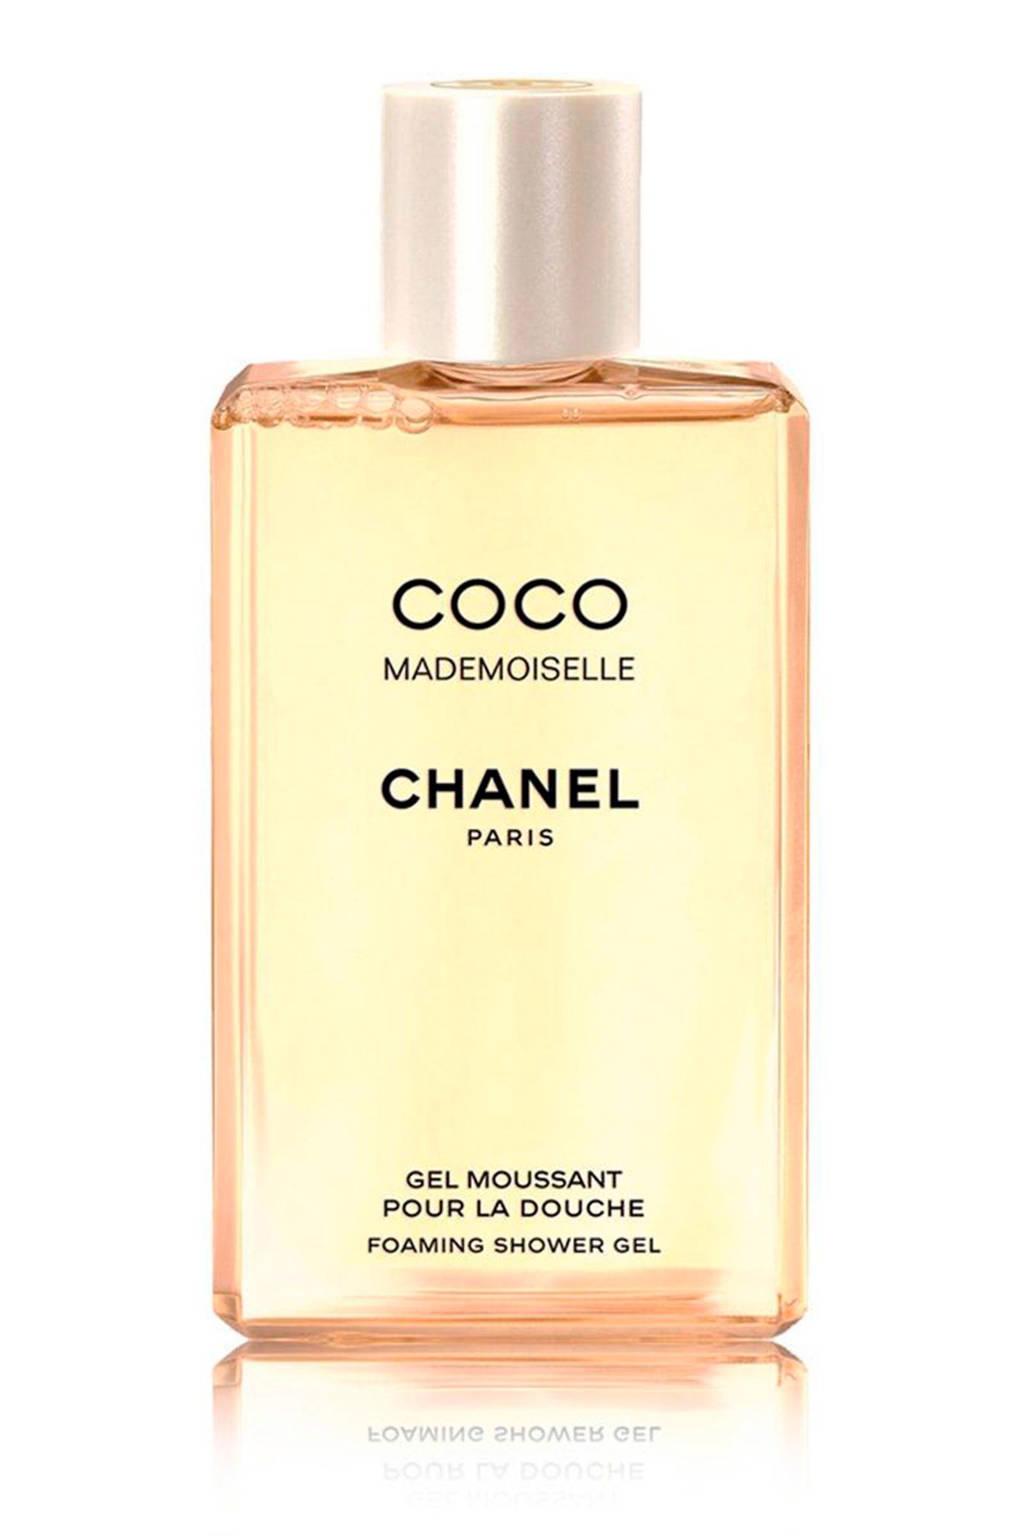 Chanel Coco Mademoiselle douchegel - 200 ml